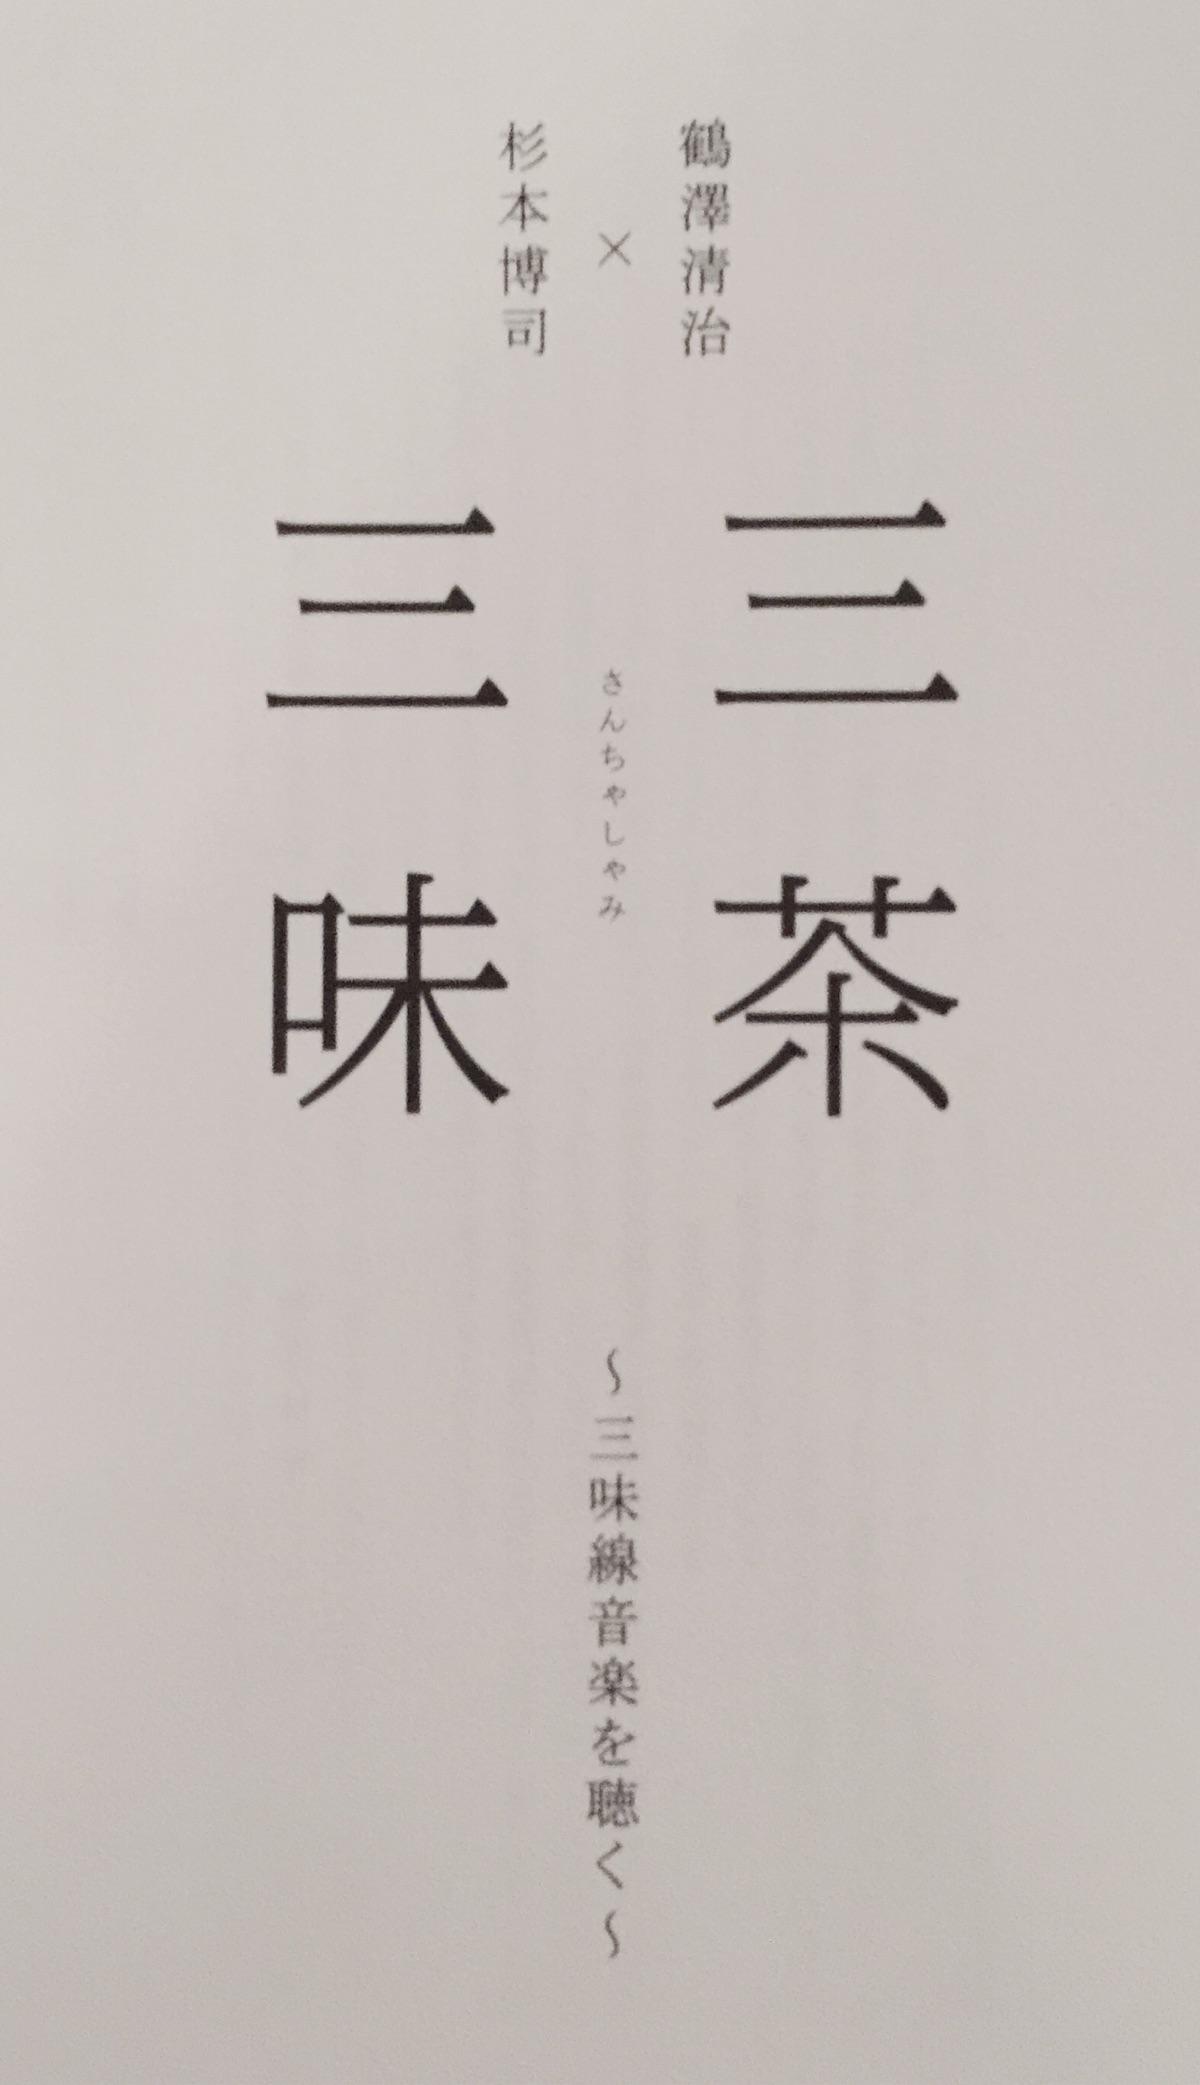 三茶三味〜三味線音楽を聴く〜